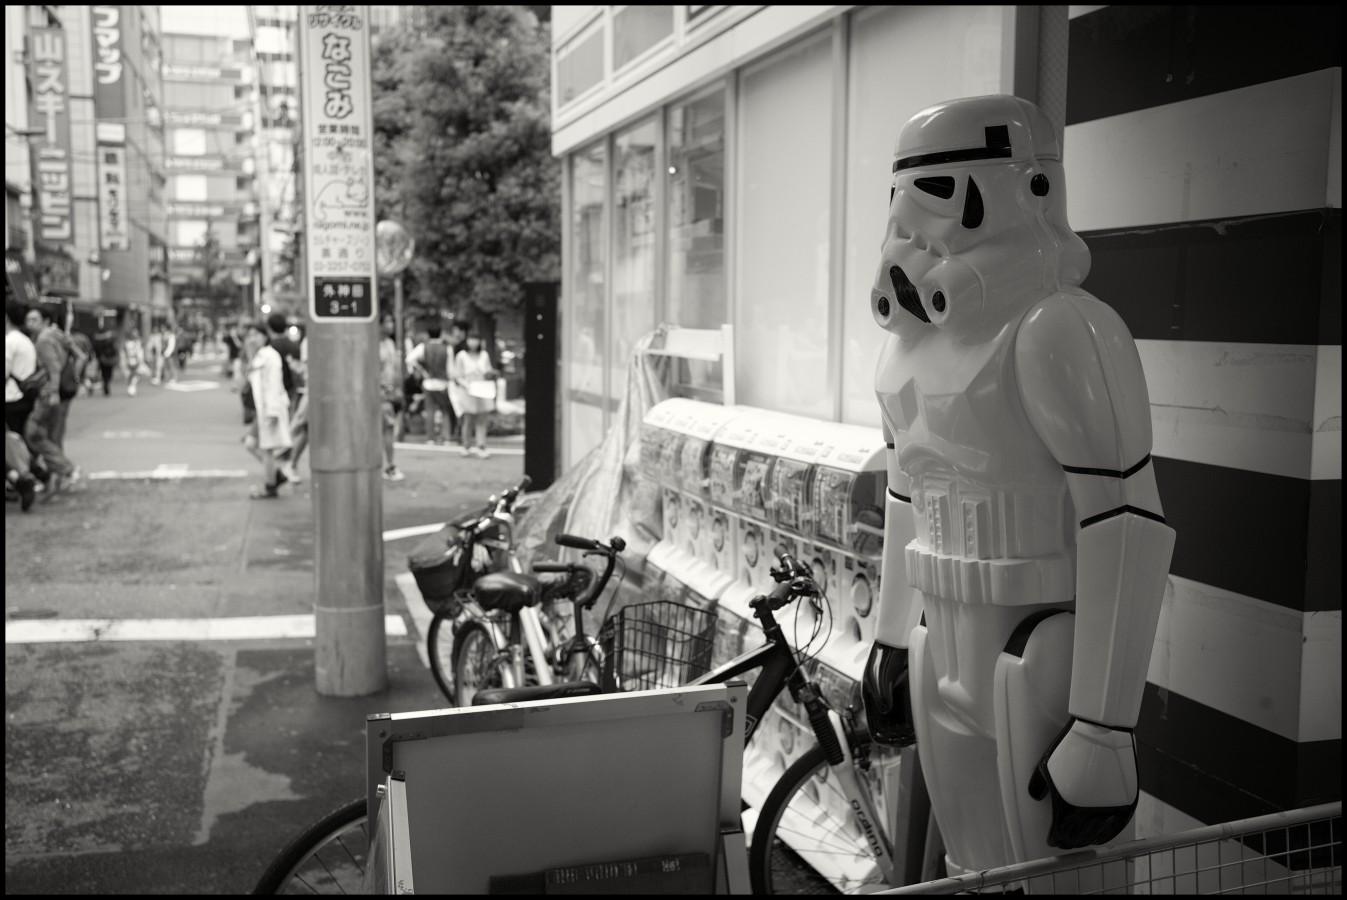 Akihabara Electric City Storm Trooper